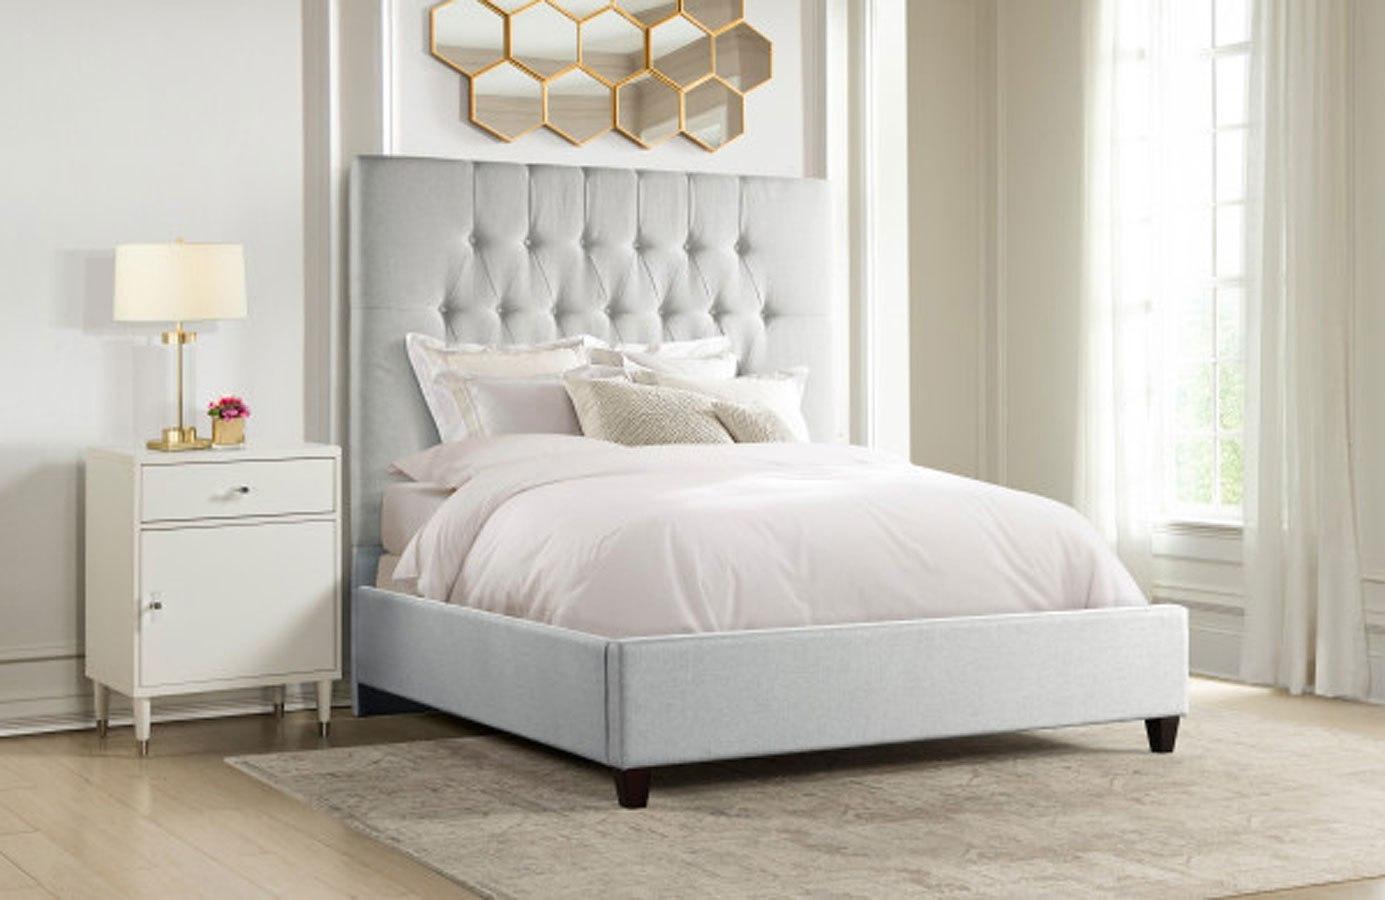 City Chic Diamond Tufted Panel Bedroom Set Light Grey By Accentrics Home Furniturepick